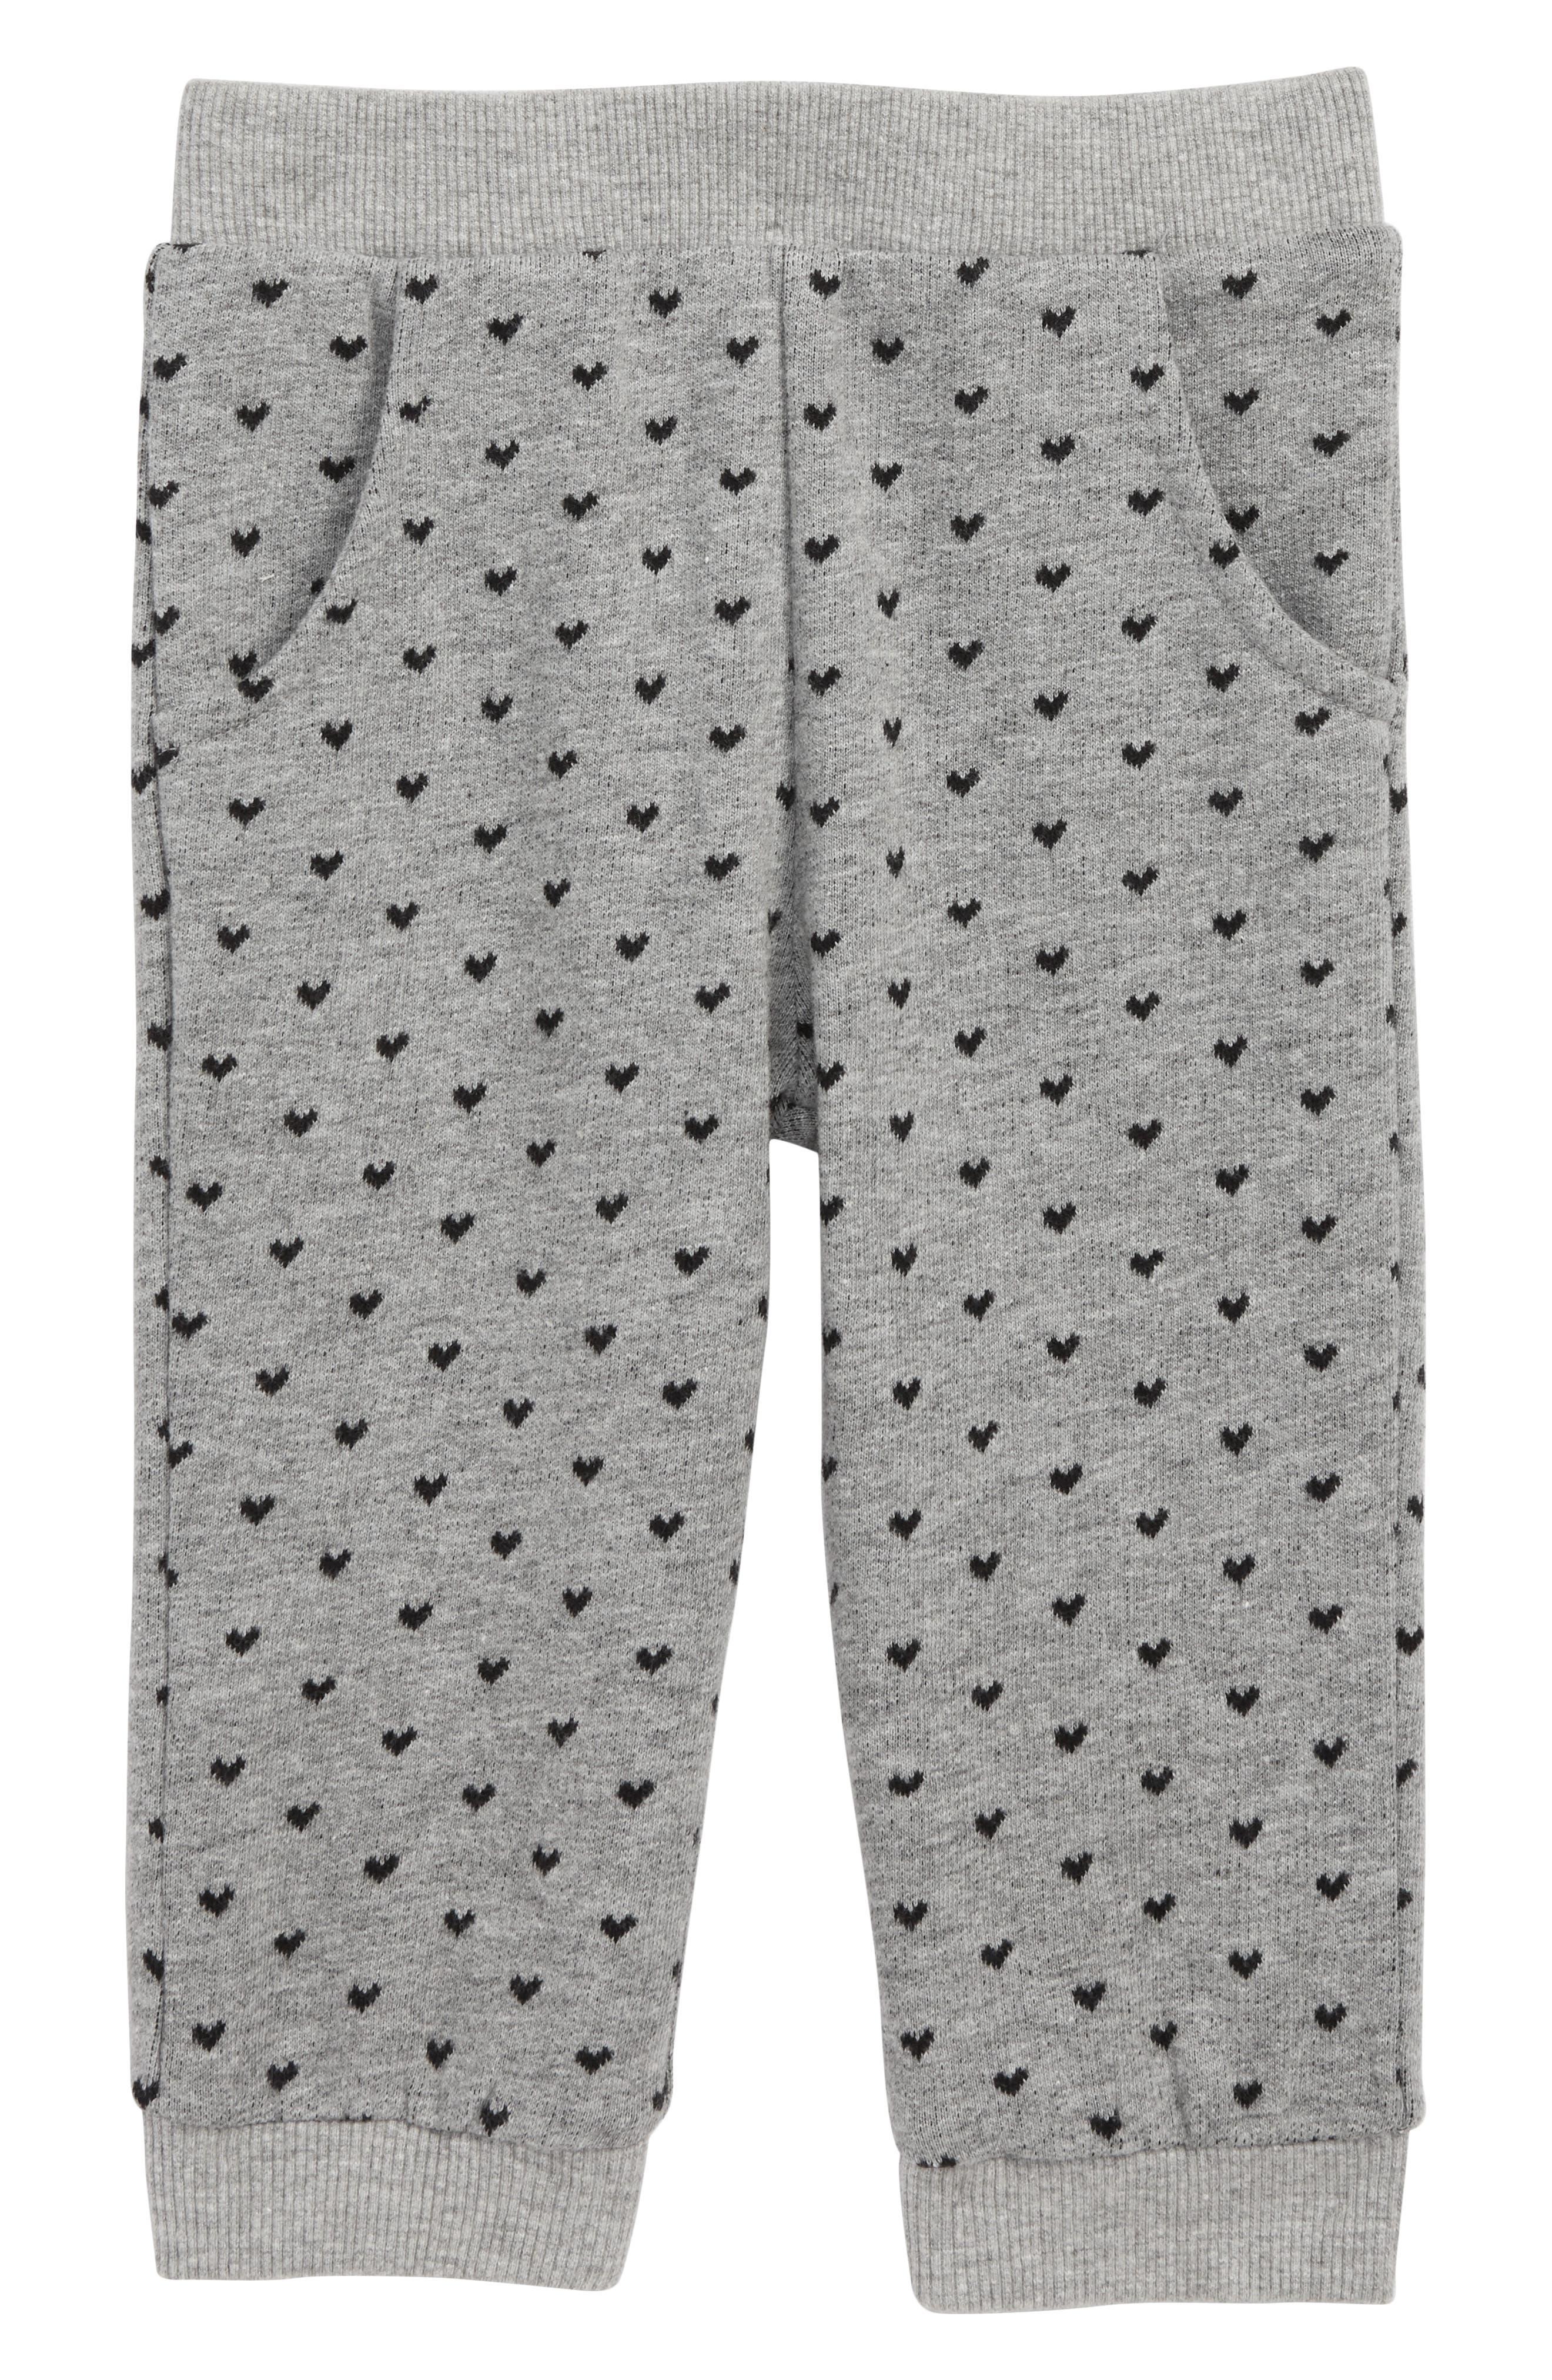 Peek Heart Traveler Knit Pants,                             Main thumbnail 1, color,                             HEATHER GREY